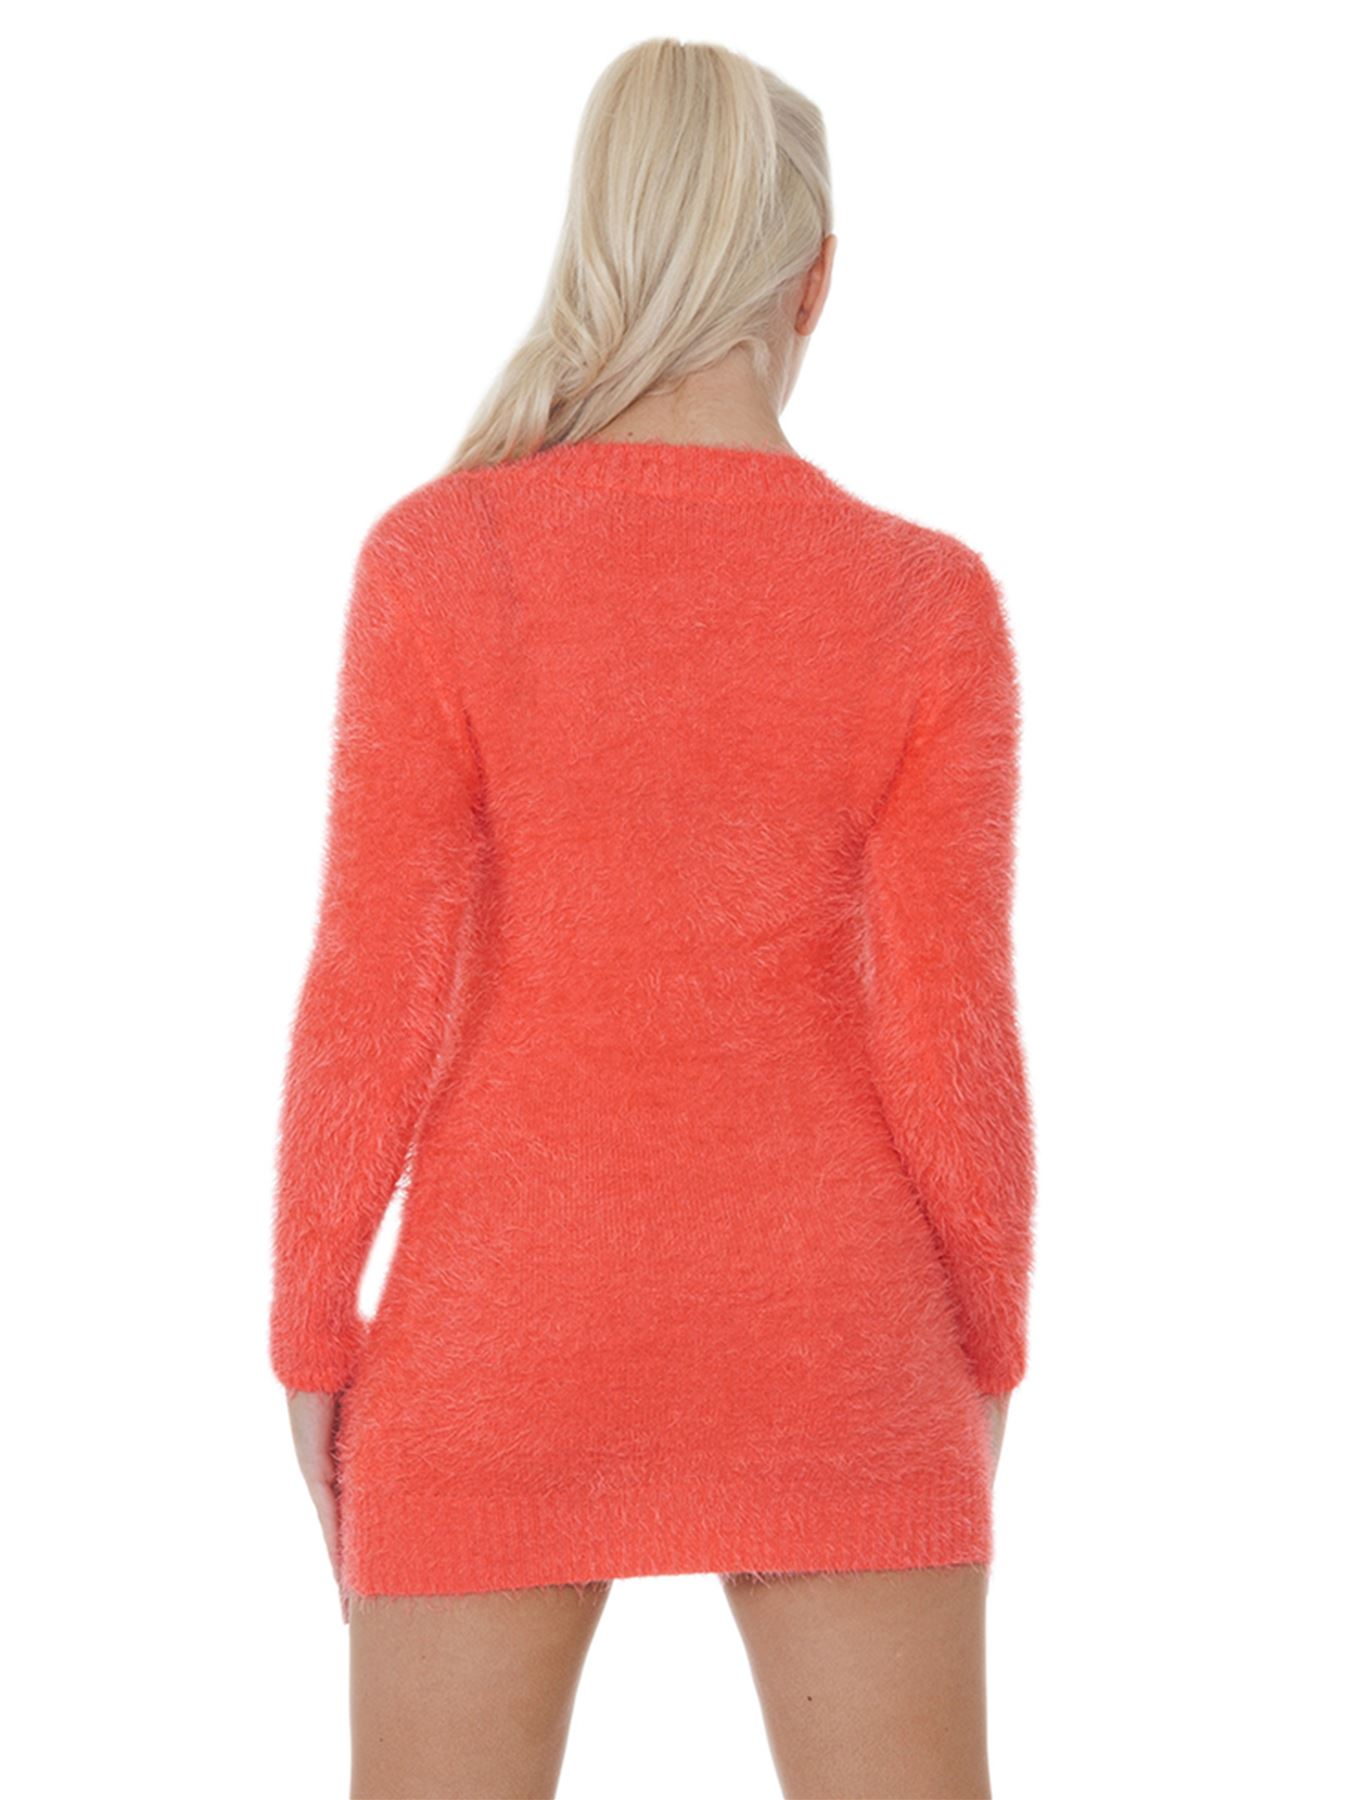 Pull-Femme-Femmes-Tricote-Cardigans-Plain-Tricot-Moelleux-Col-V-Manches-Longues miniature 14